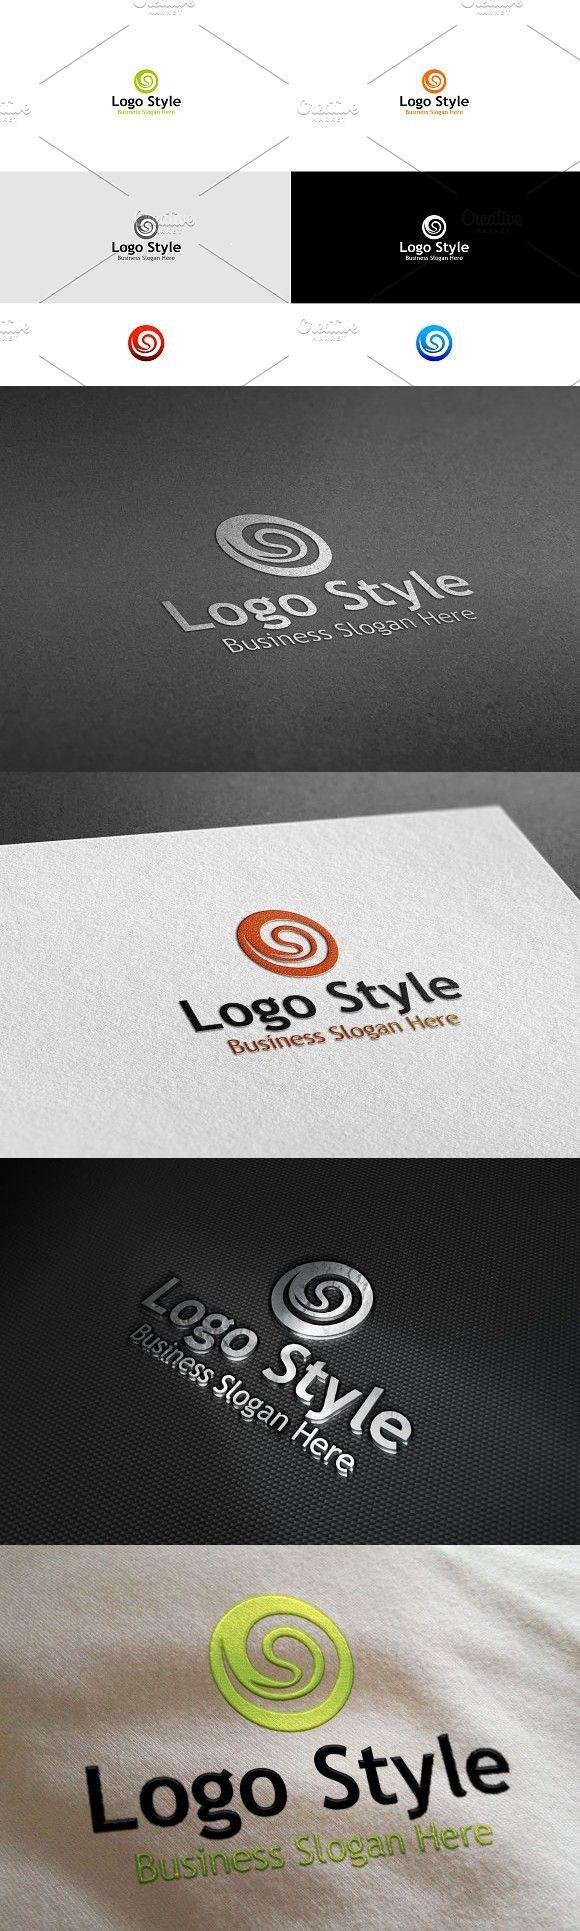 Circle Style Logo Pinterest